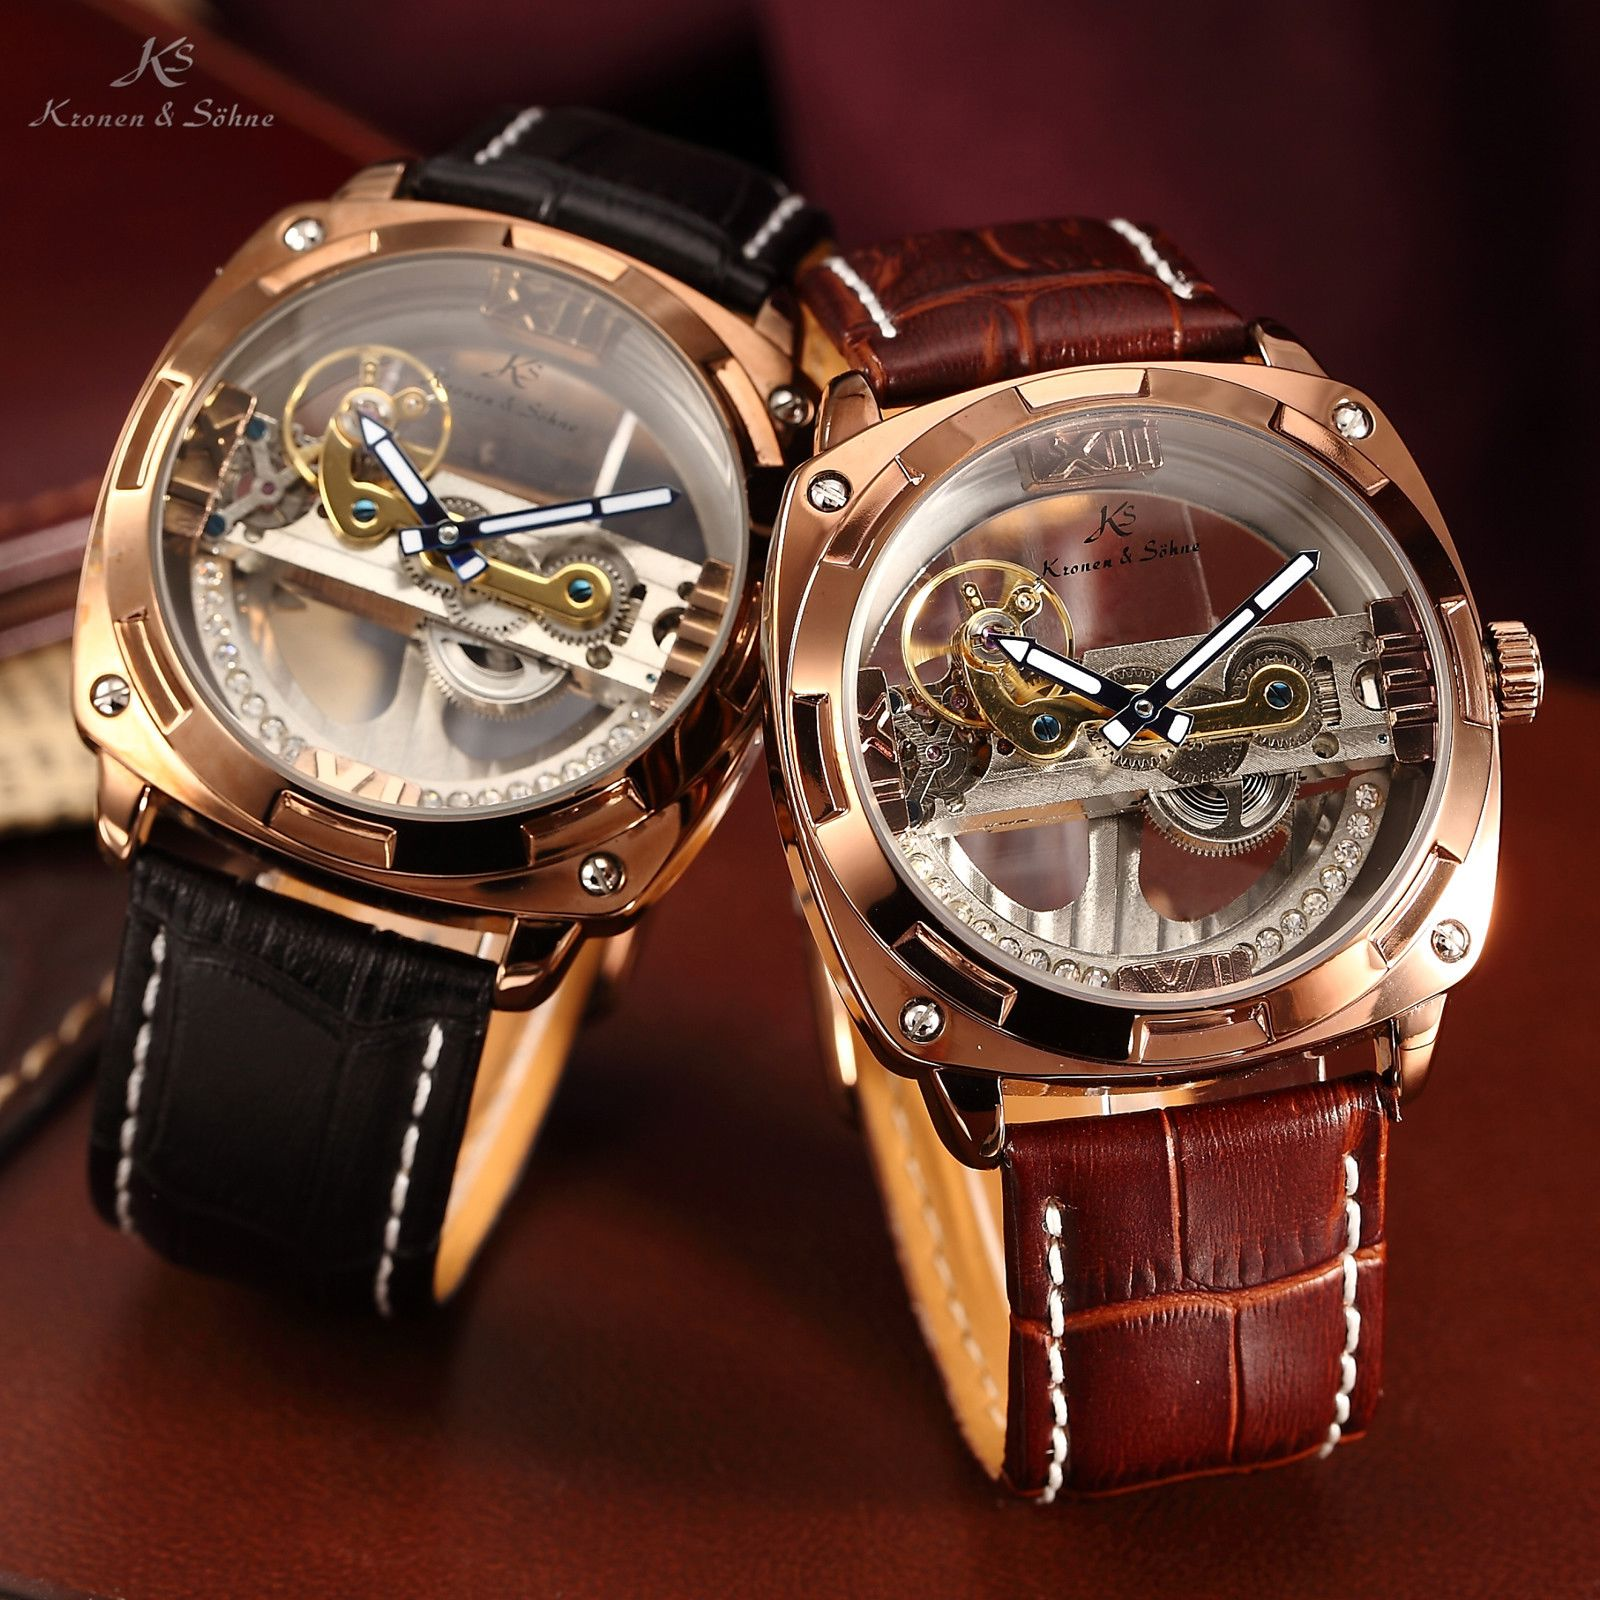 Популярные швейцарские часы